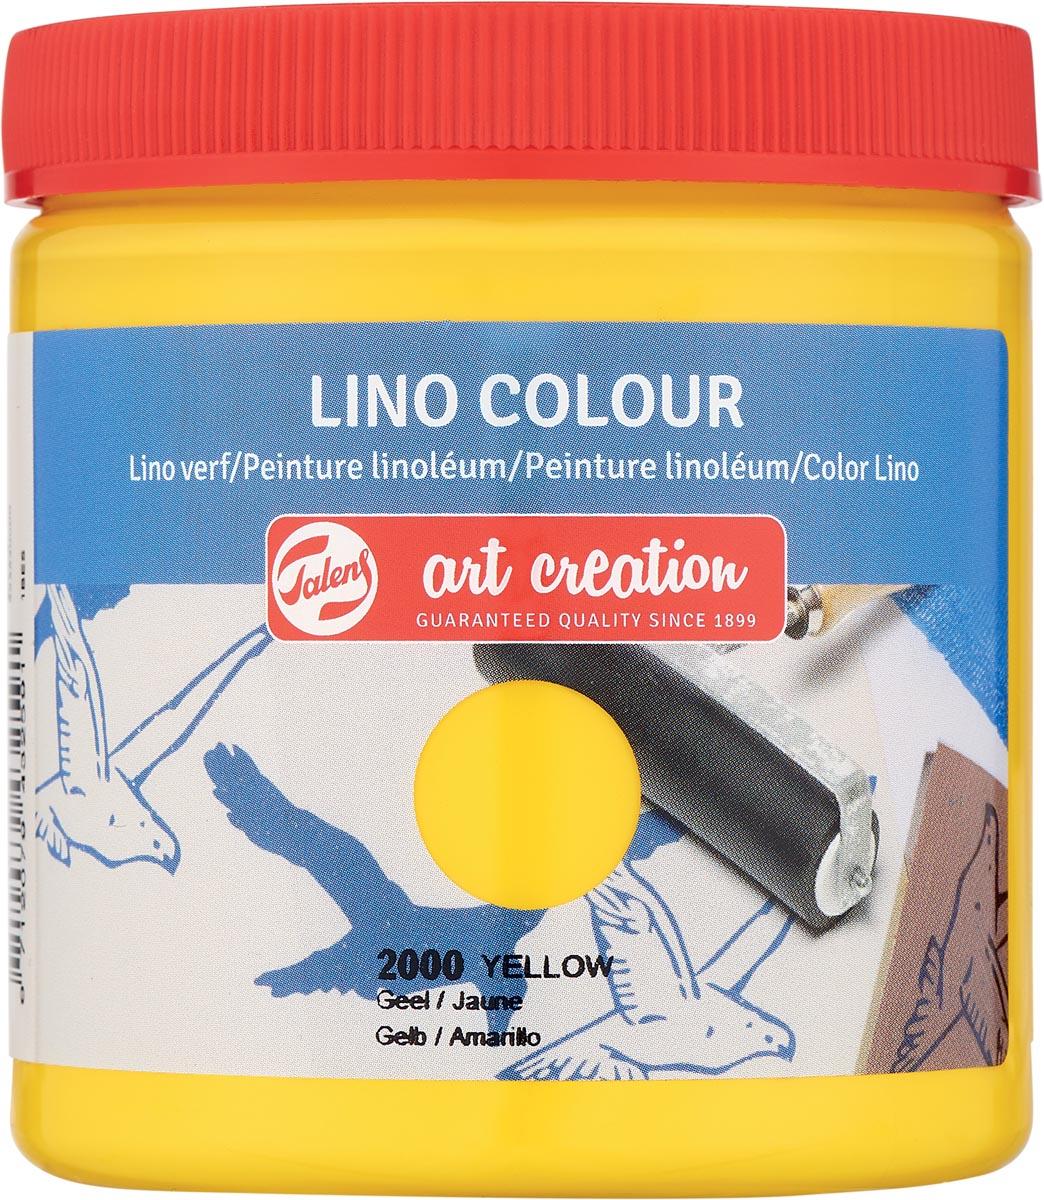 Talens Art Creation lino verf, geel